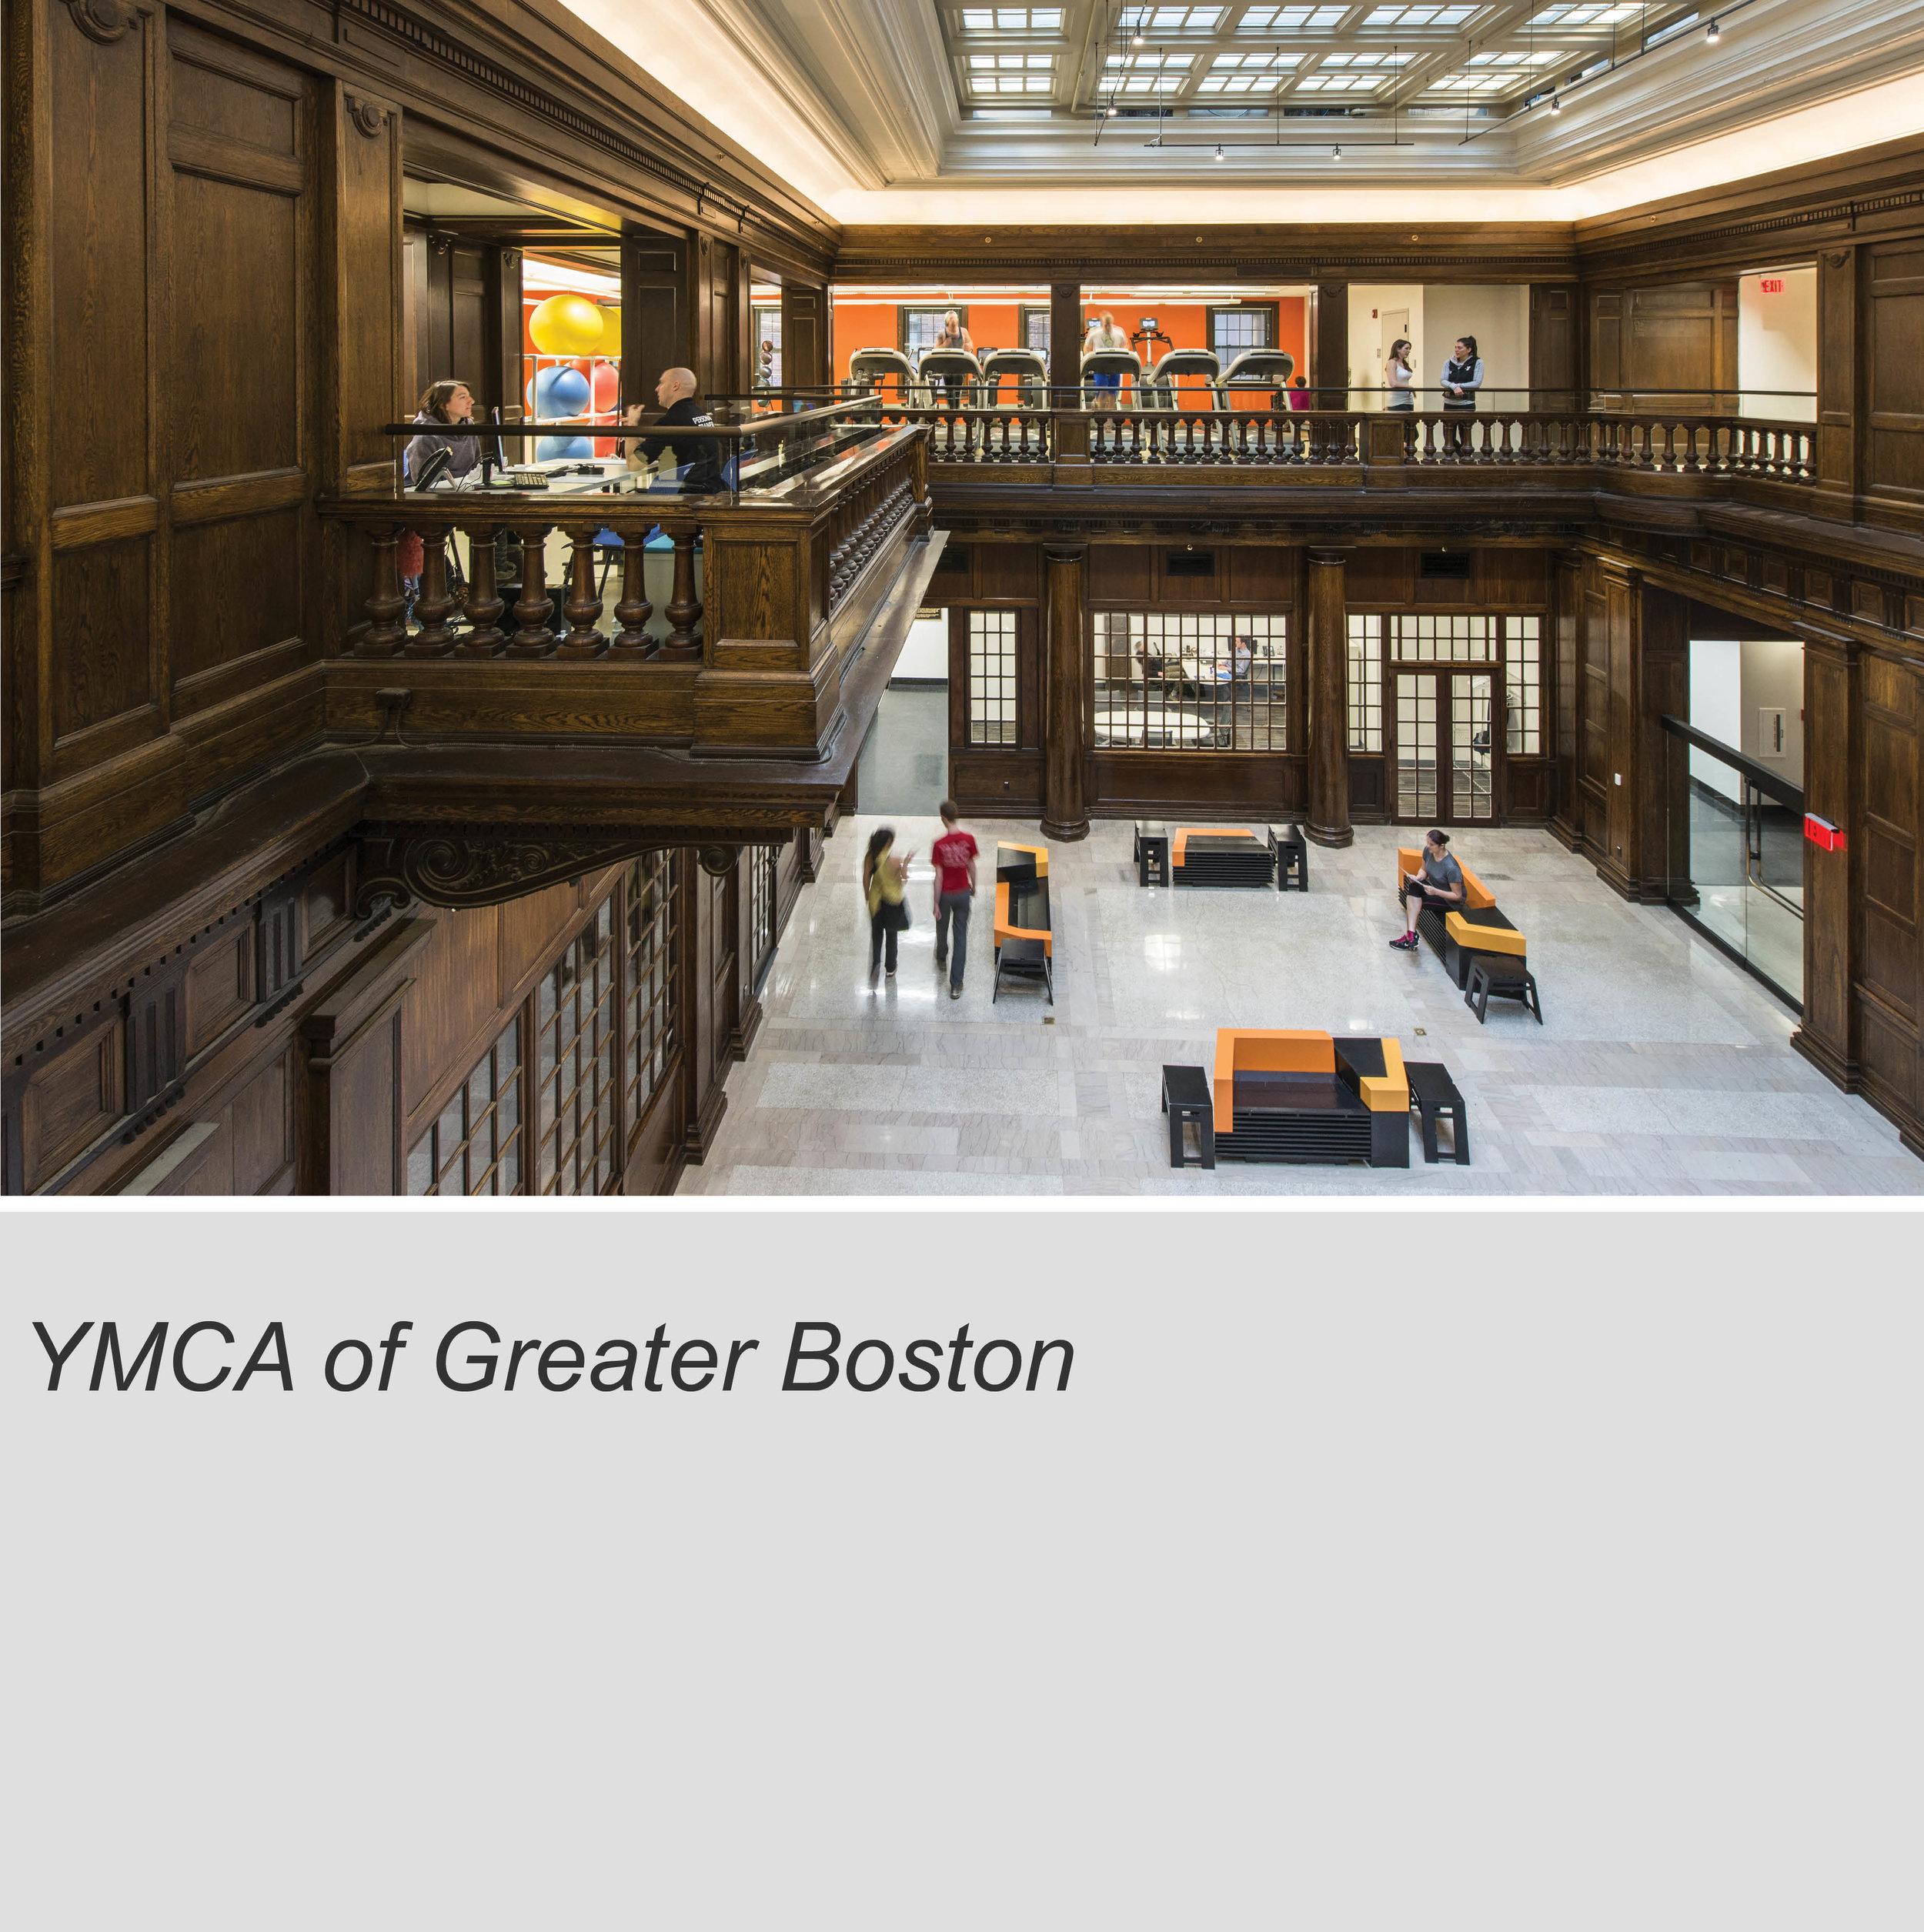 YMCA_Greater_Boston.jpg